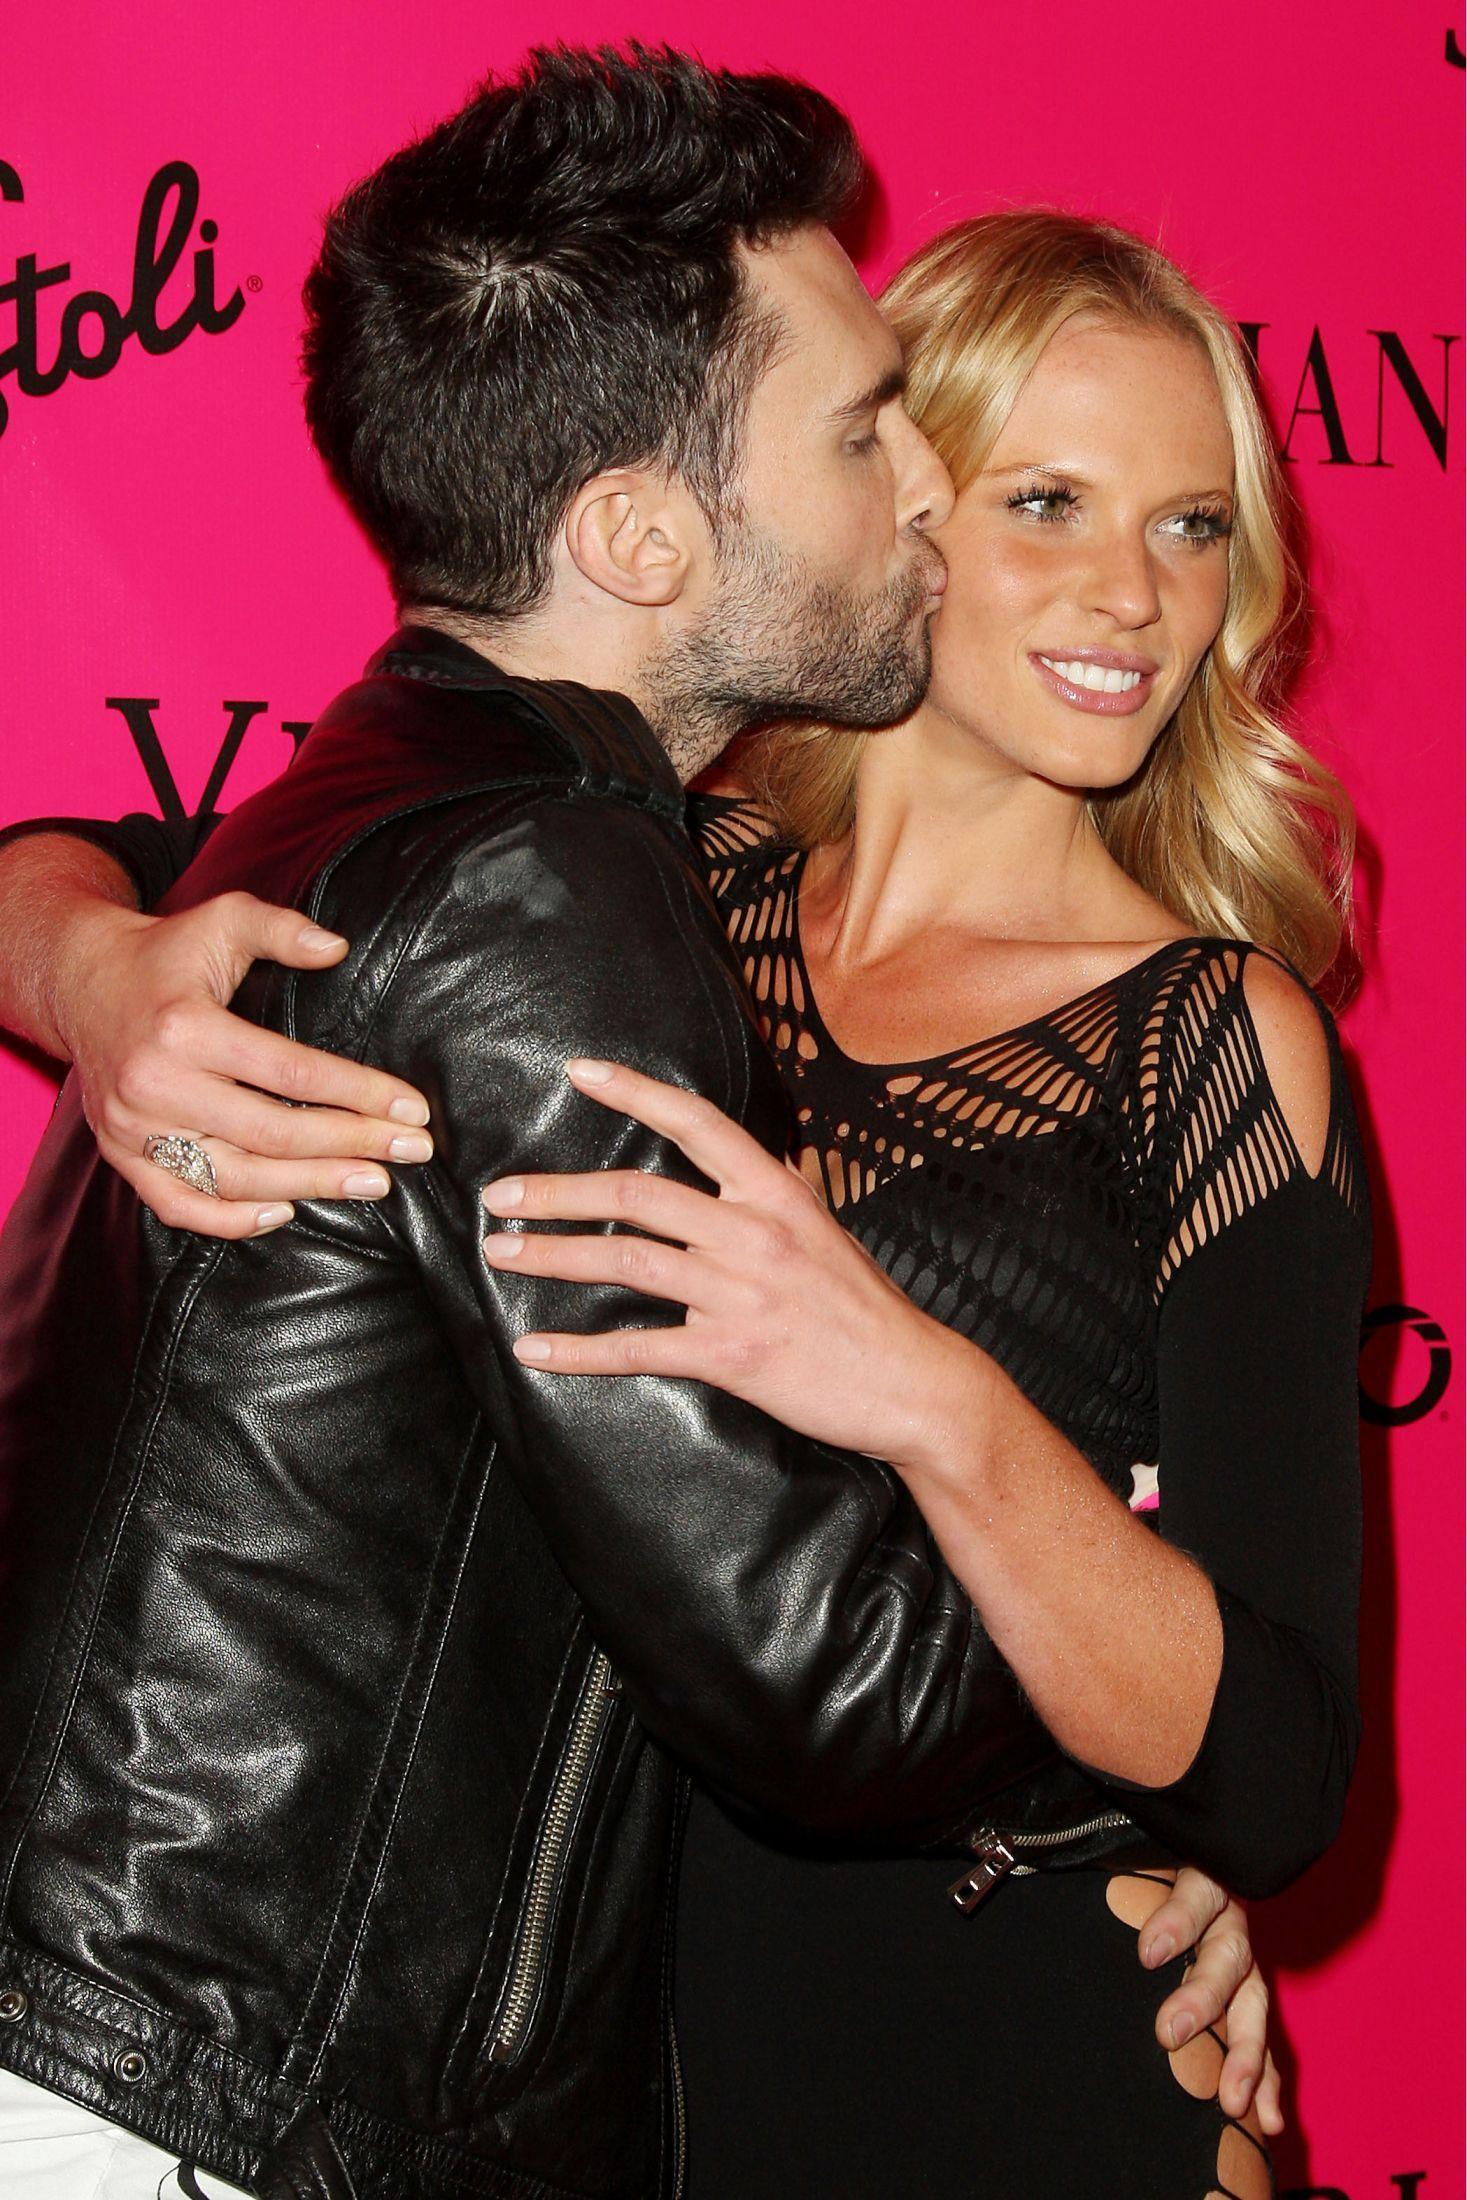 adam and anne v